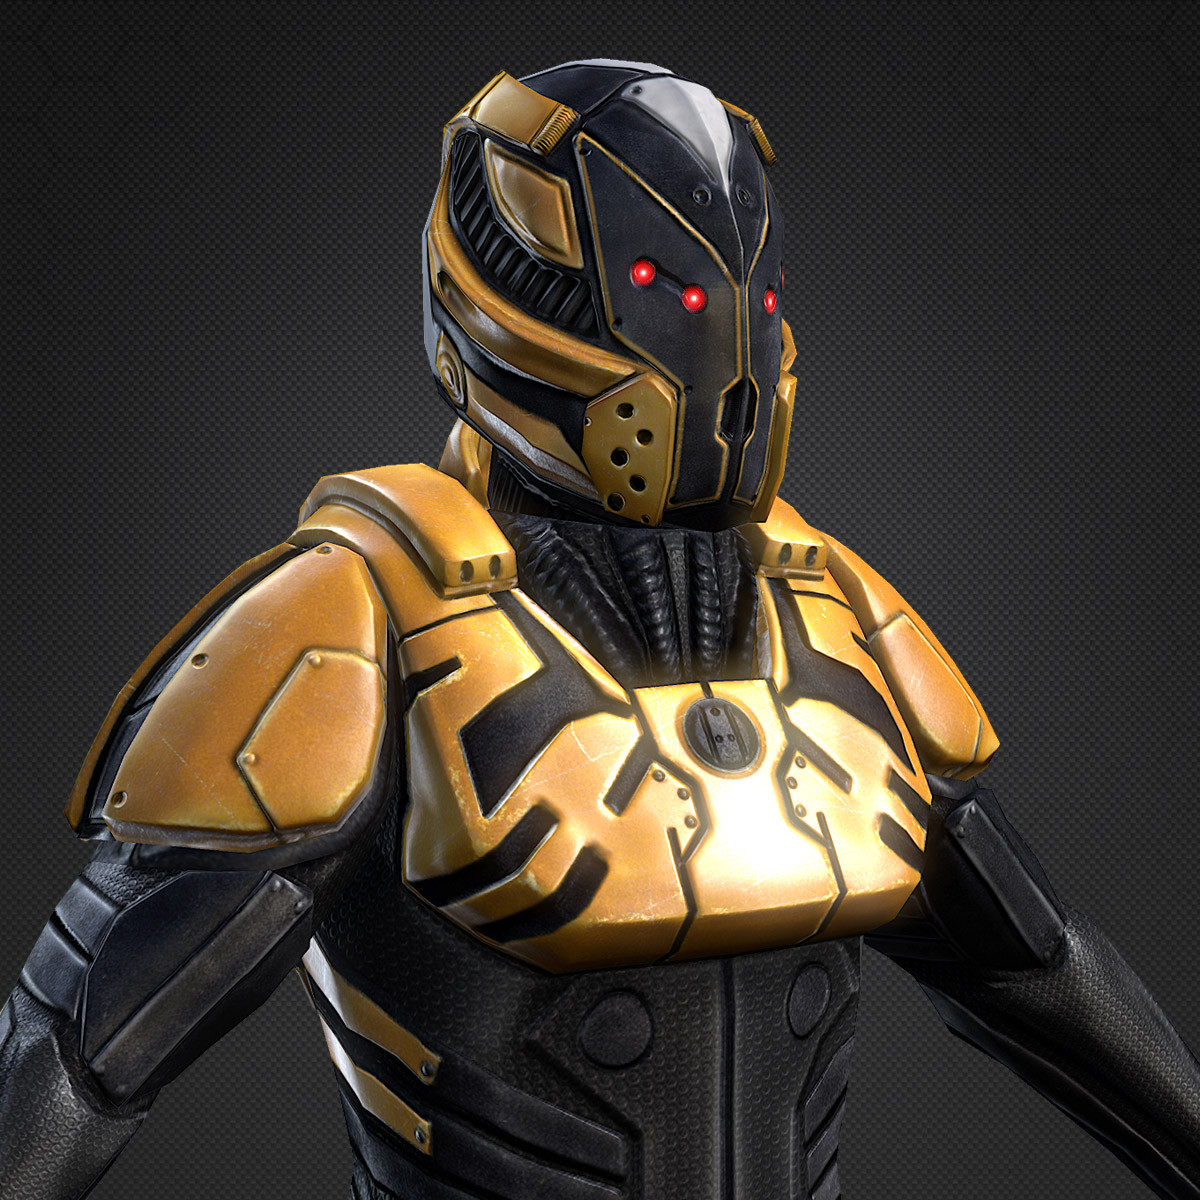 armor_20.jpgaa0a5740-f53c-49cb-9e1c-3ea0